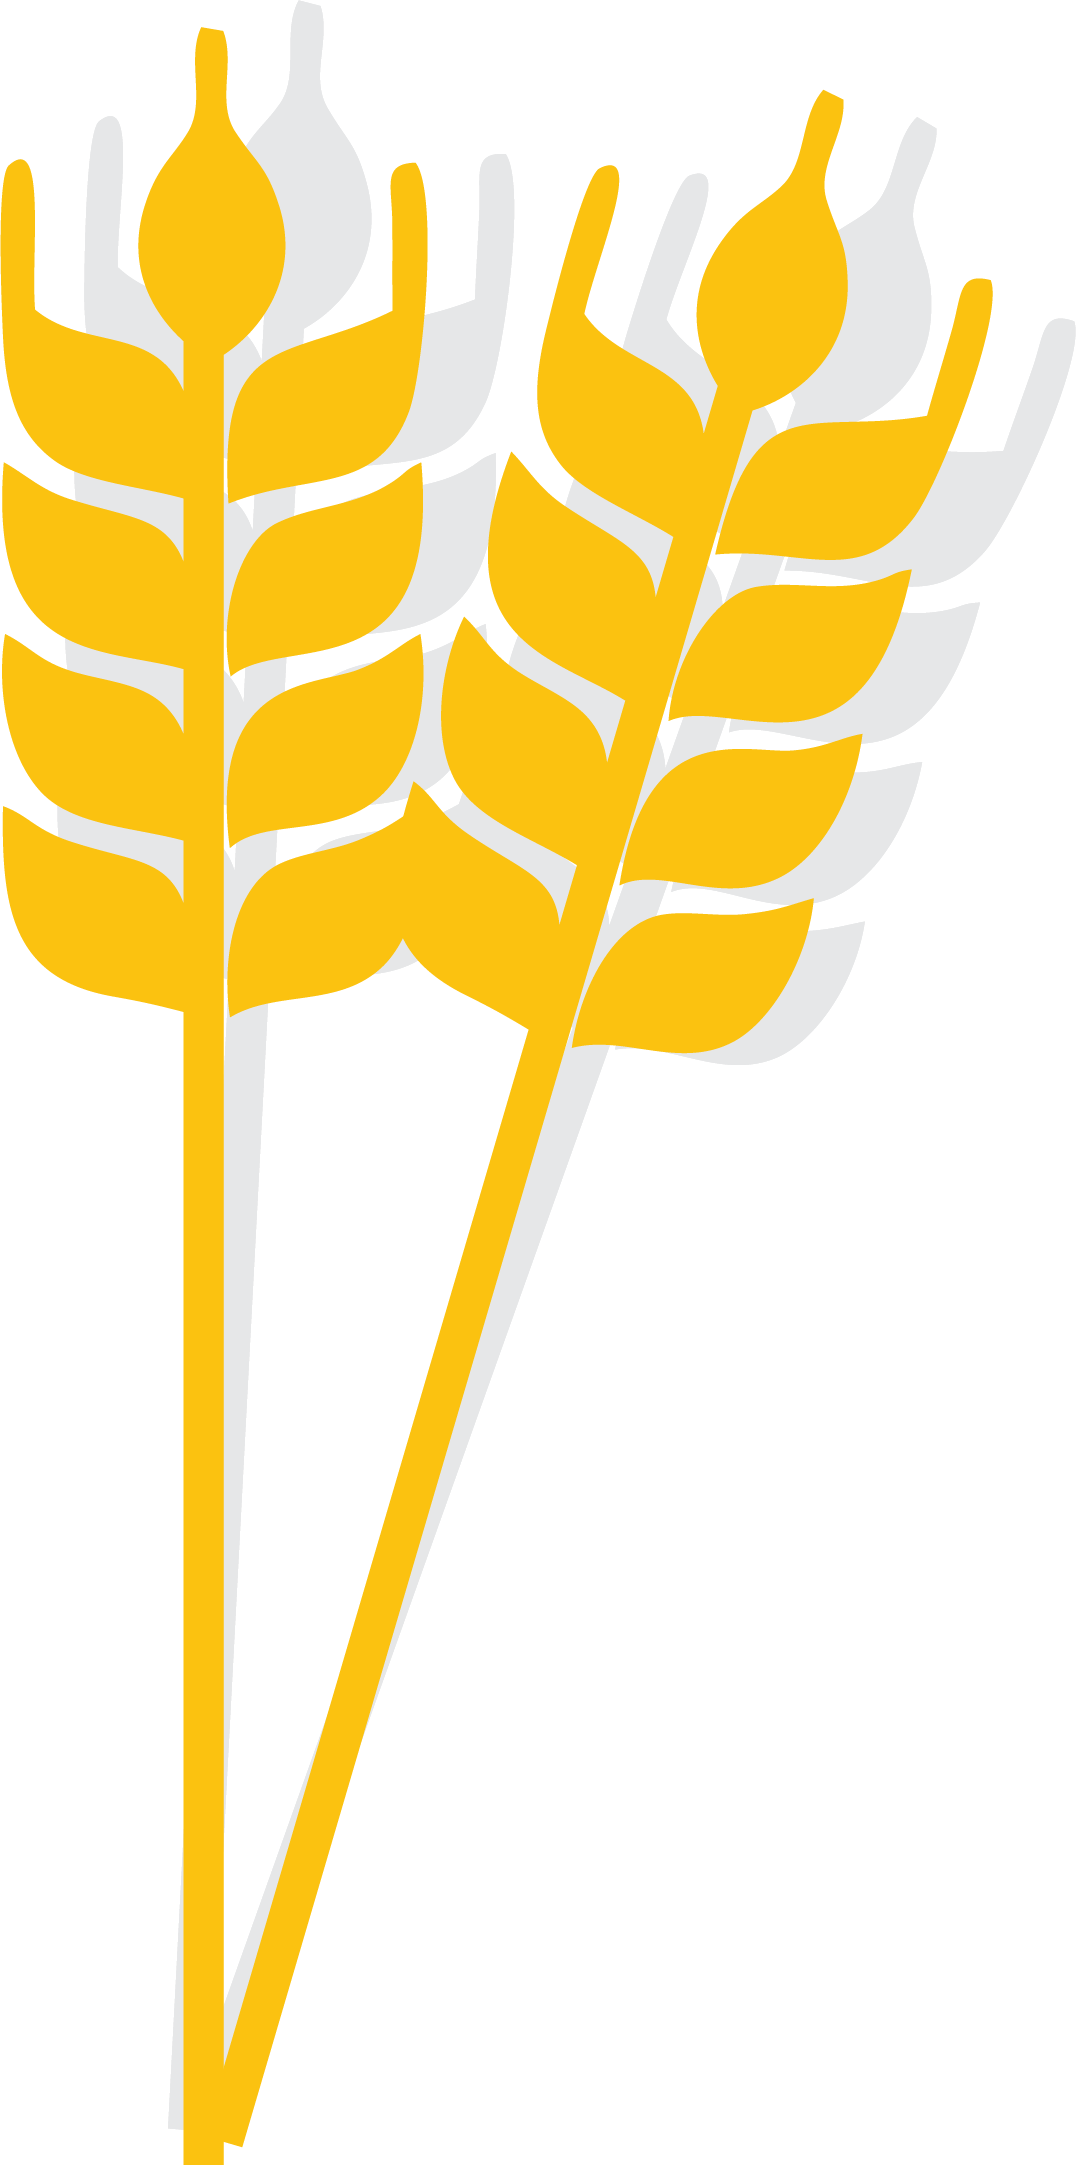 Wheat clipart wheat spike. Rice cartoon icon gold